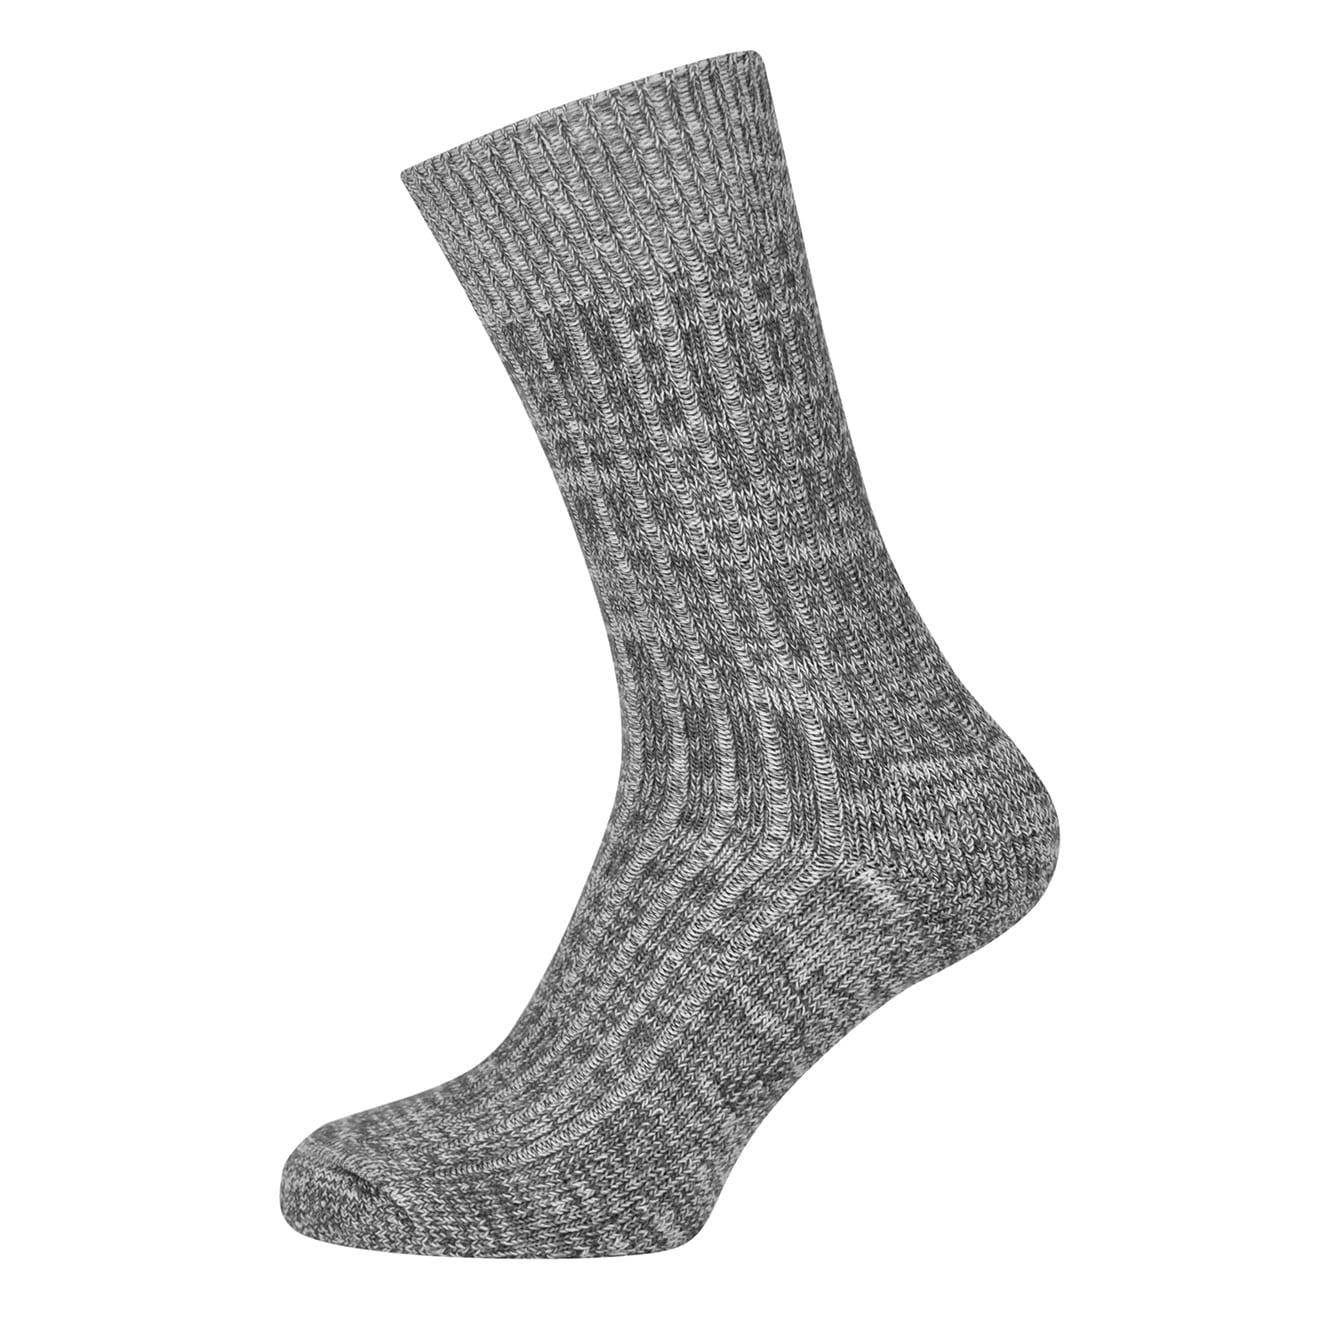 Macfarlaine Cushion Sole Fleck Socks Grey / Air